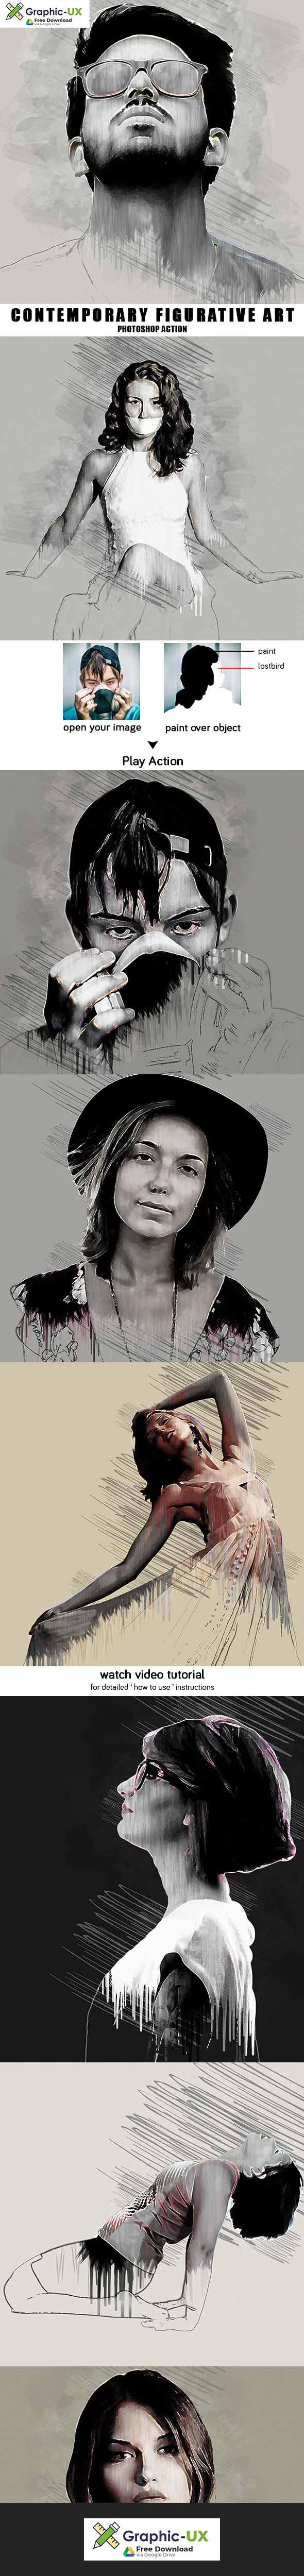 Contemporary Figurative Art - Photoshop Action